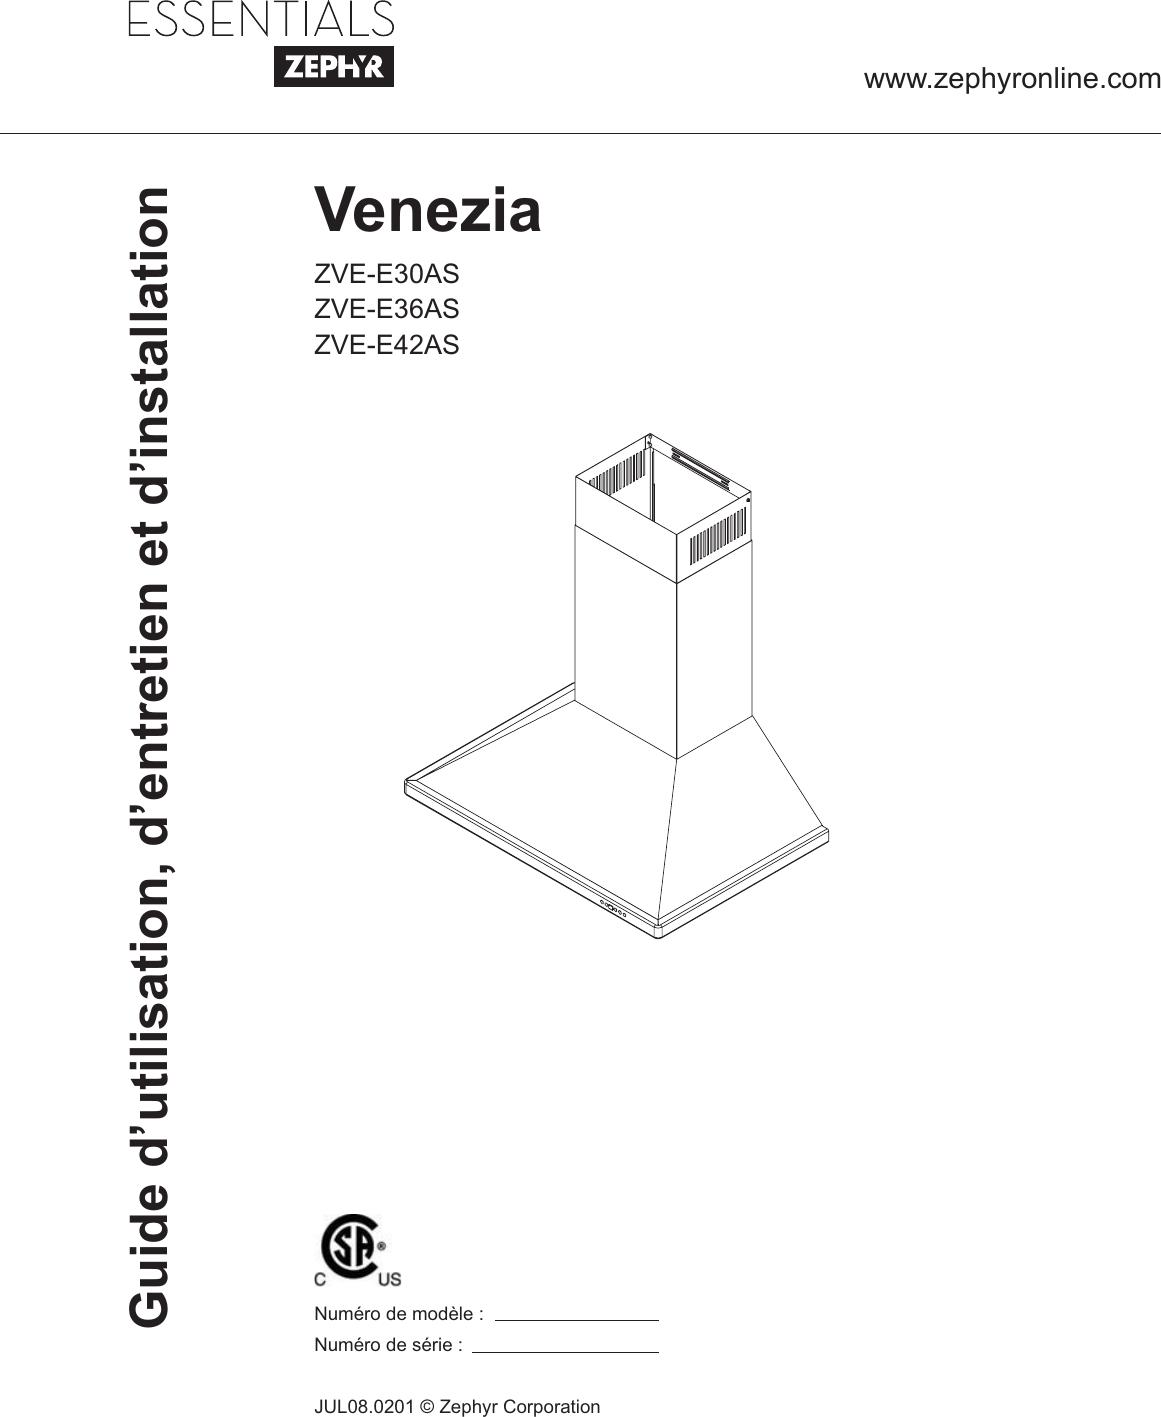 Zephyr Zve E30As Users Manual VENEZIA FR